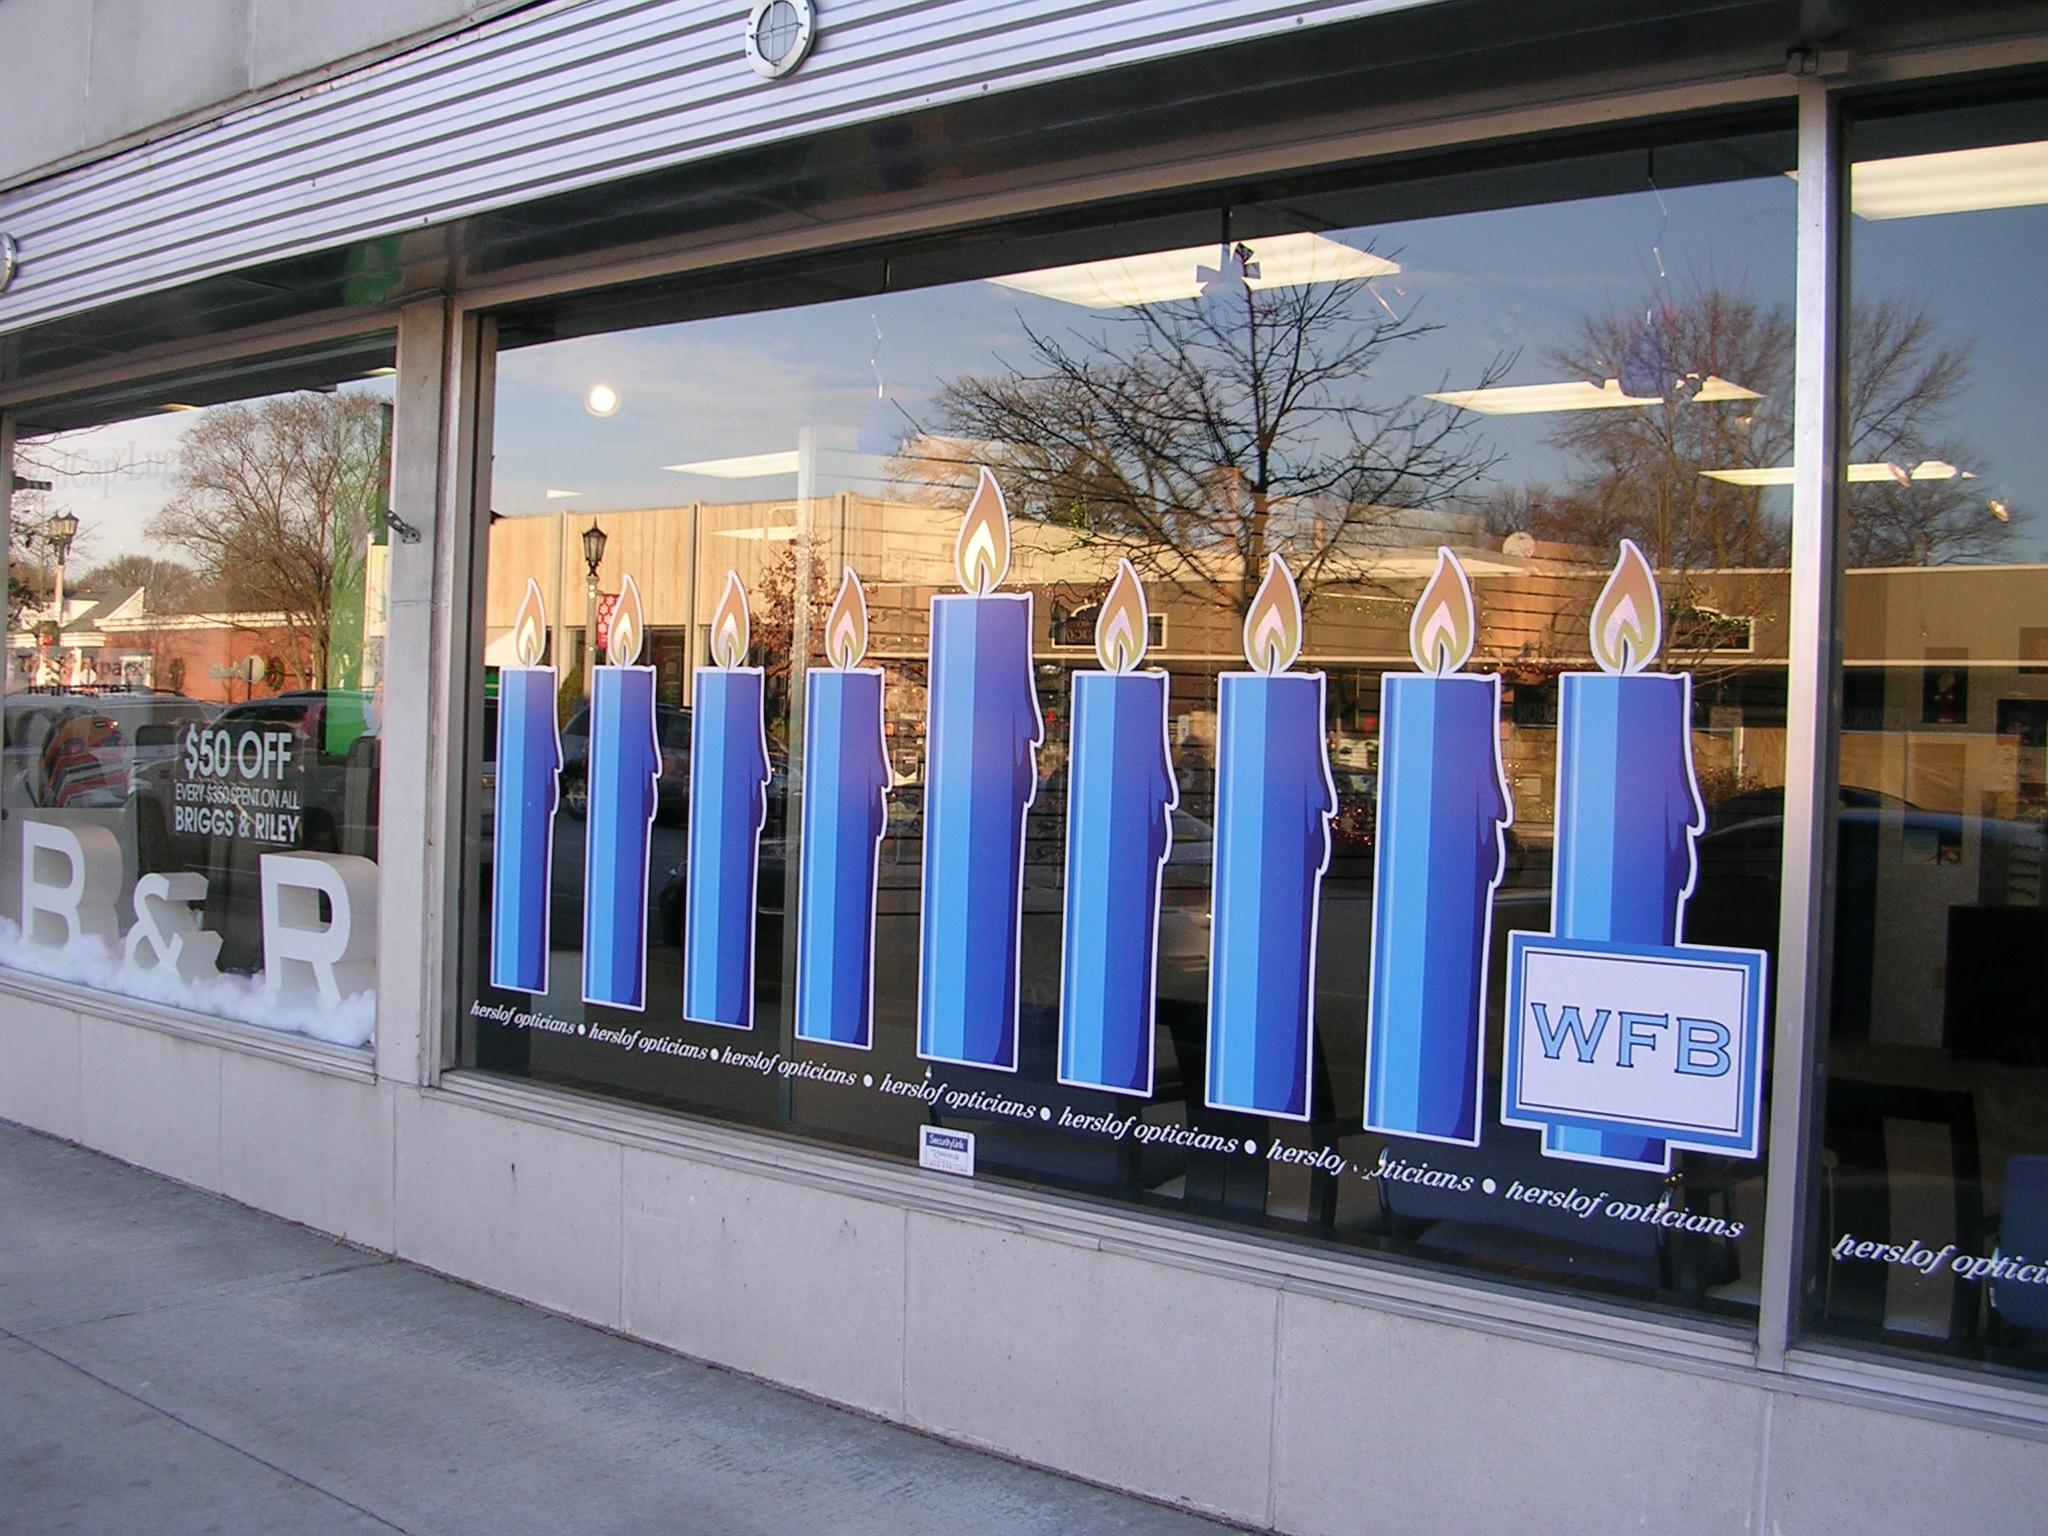 Vacant Storefront Whitefish Bay